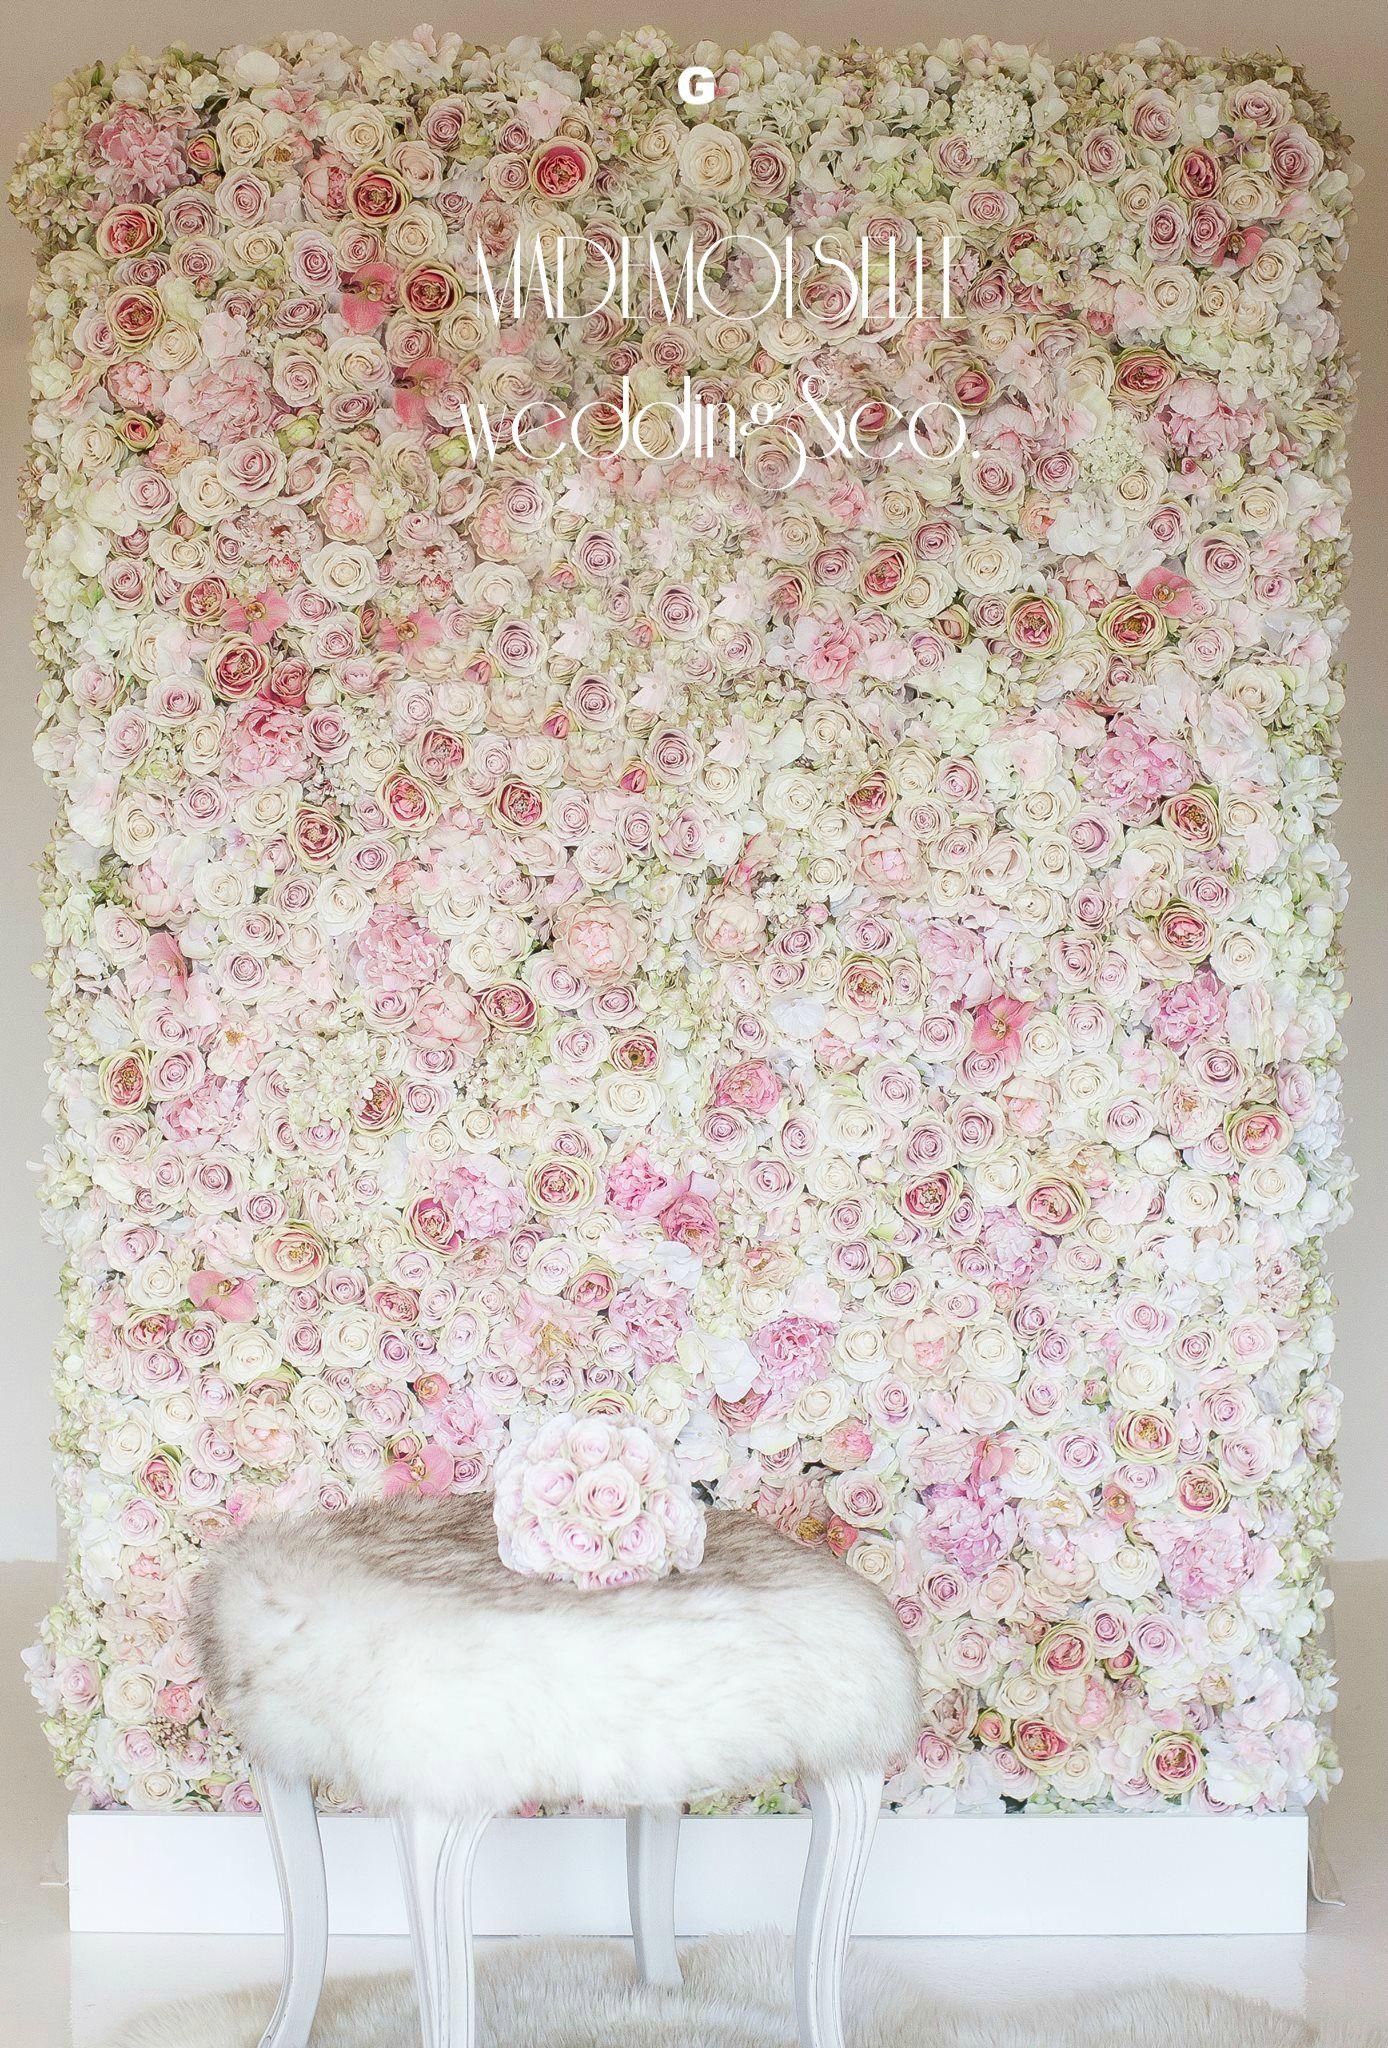 cvetni zid - 010